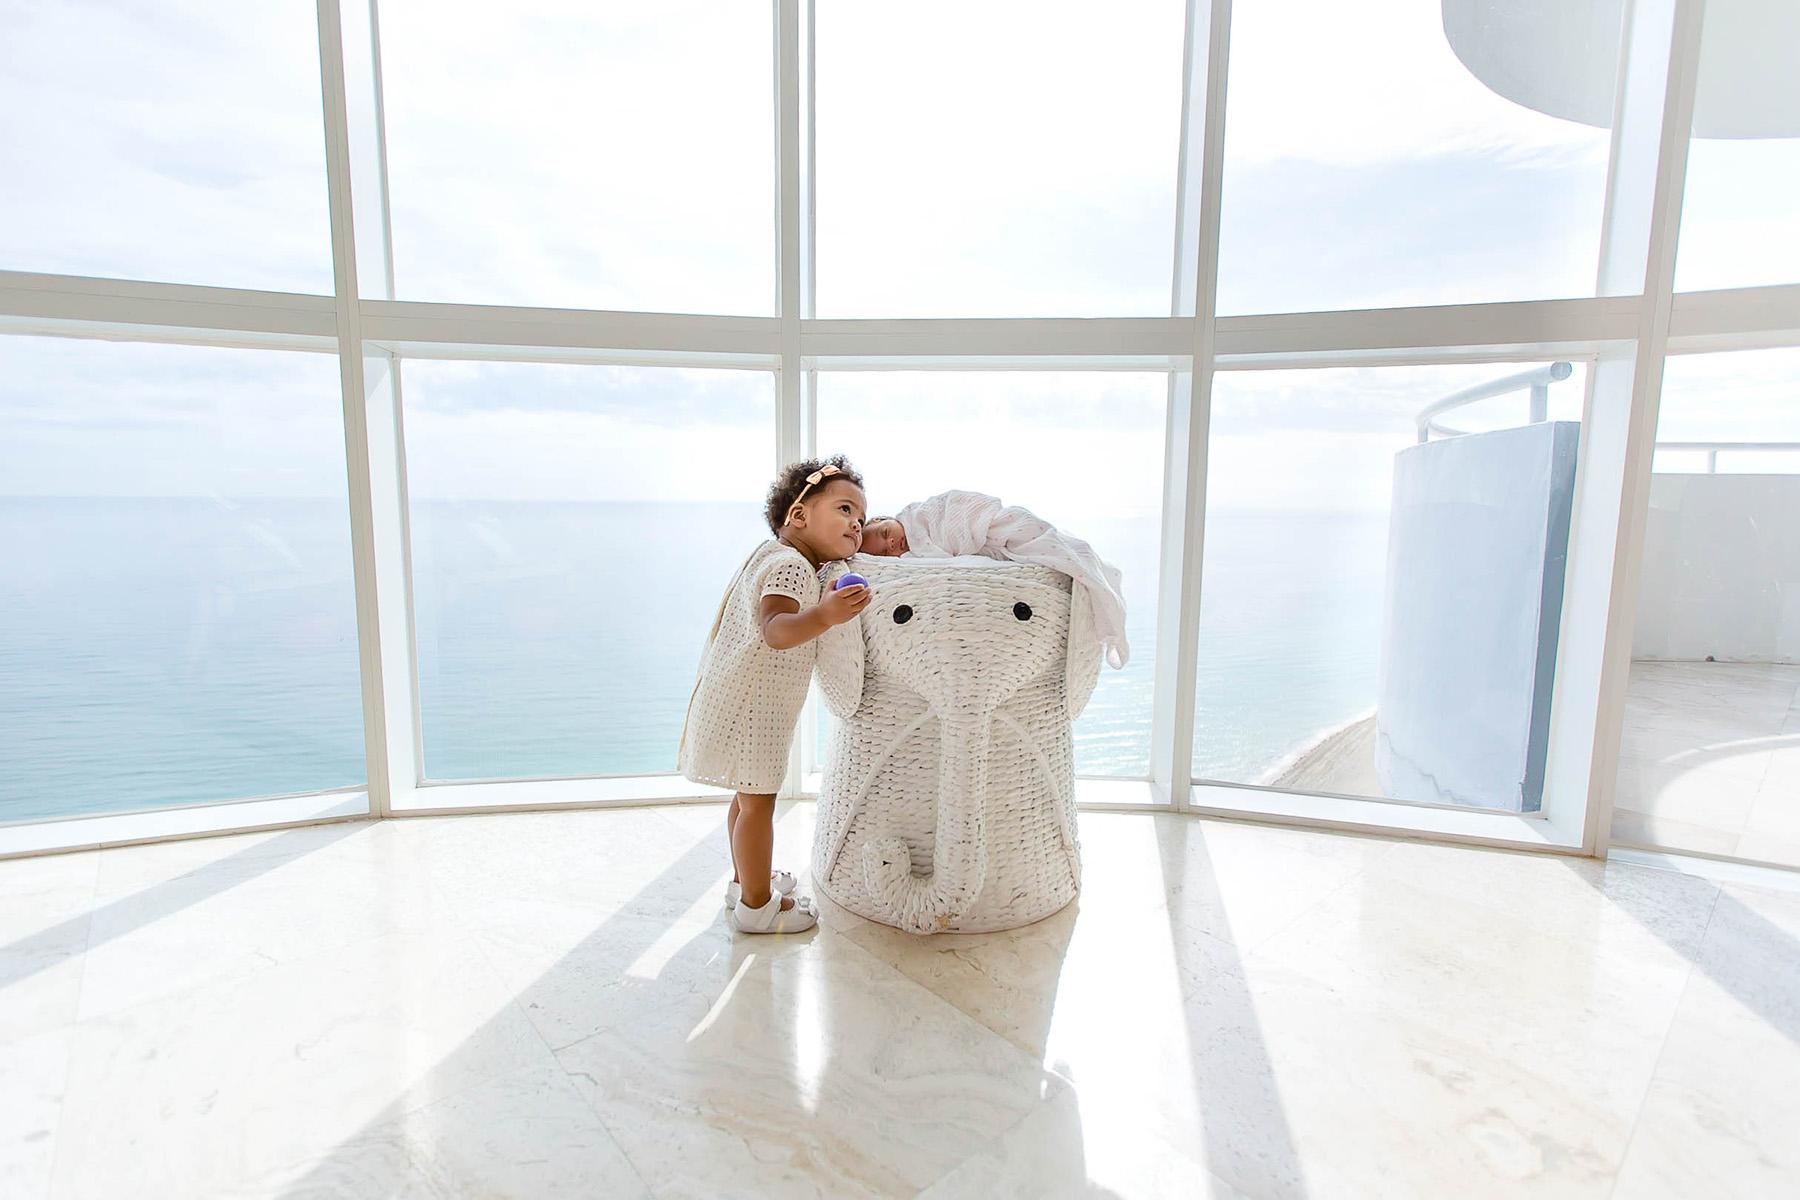 miami-highrise-newborn-photography-epic-amazing-portraits.jpg